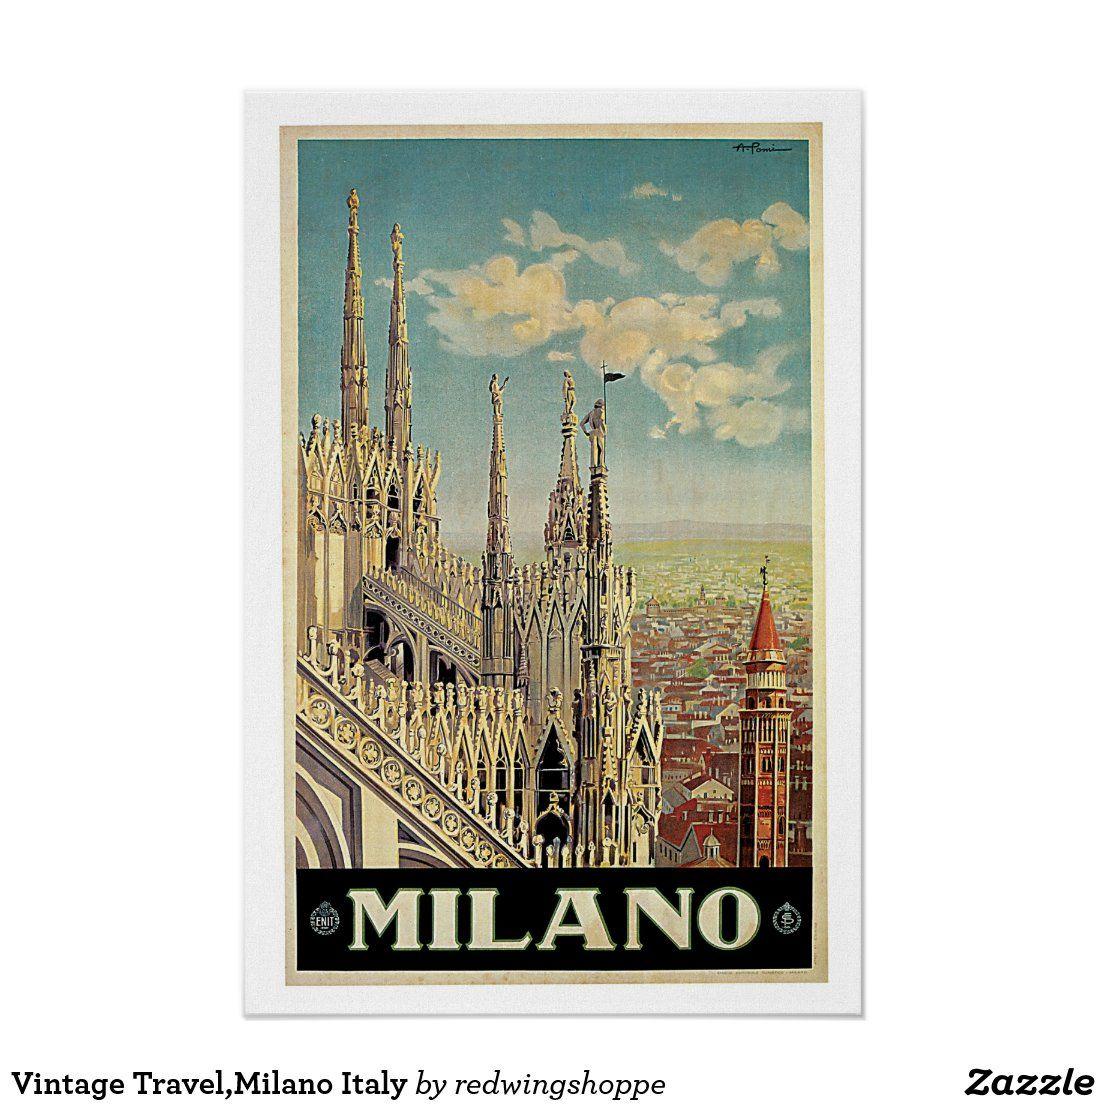 Vintage Travel,Milano Italy Poster #Milano #Italy #Travel #Posters